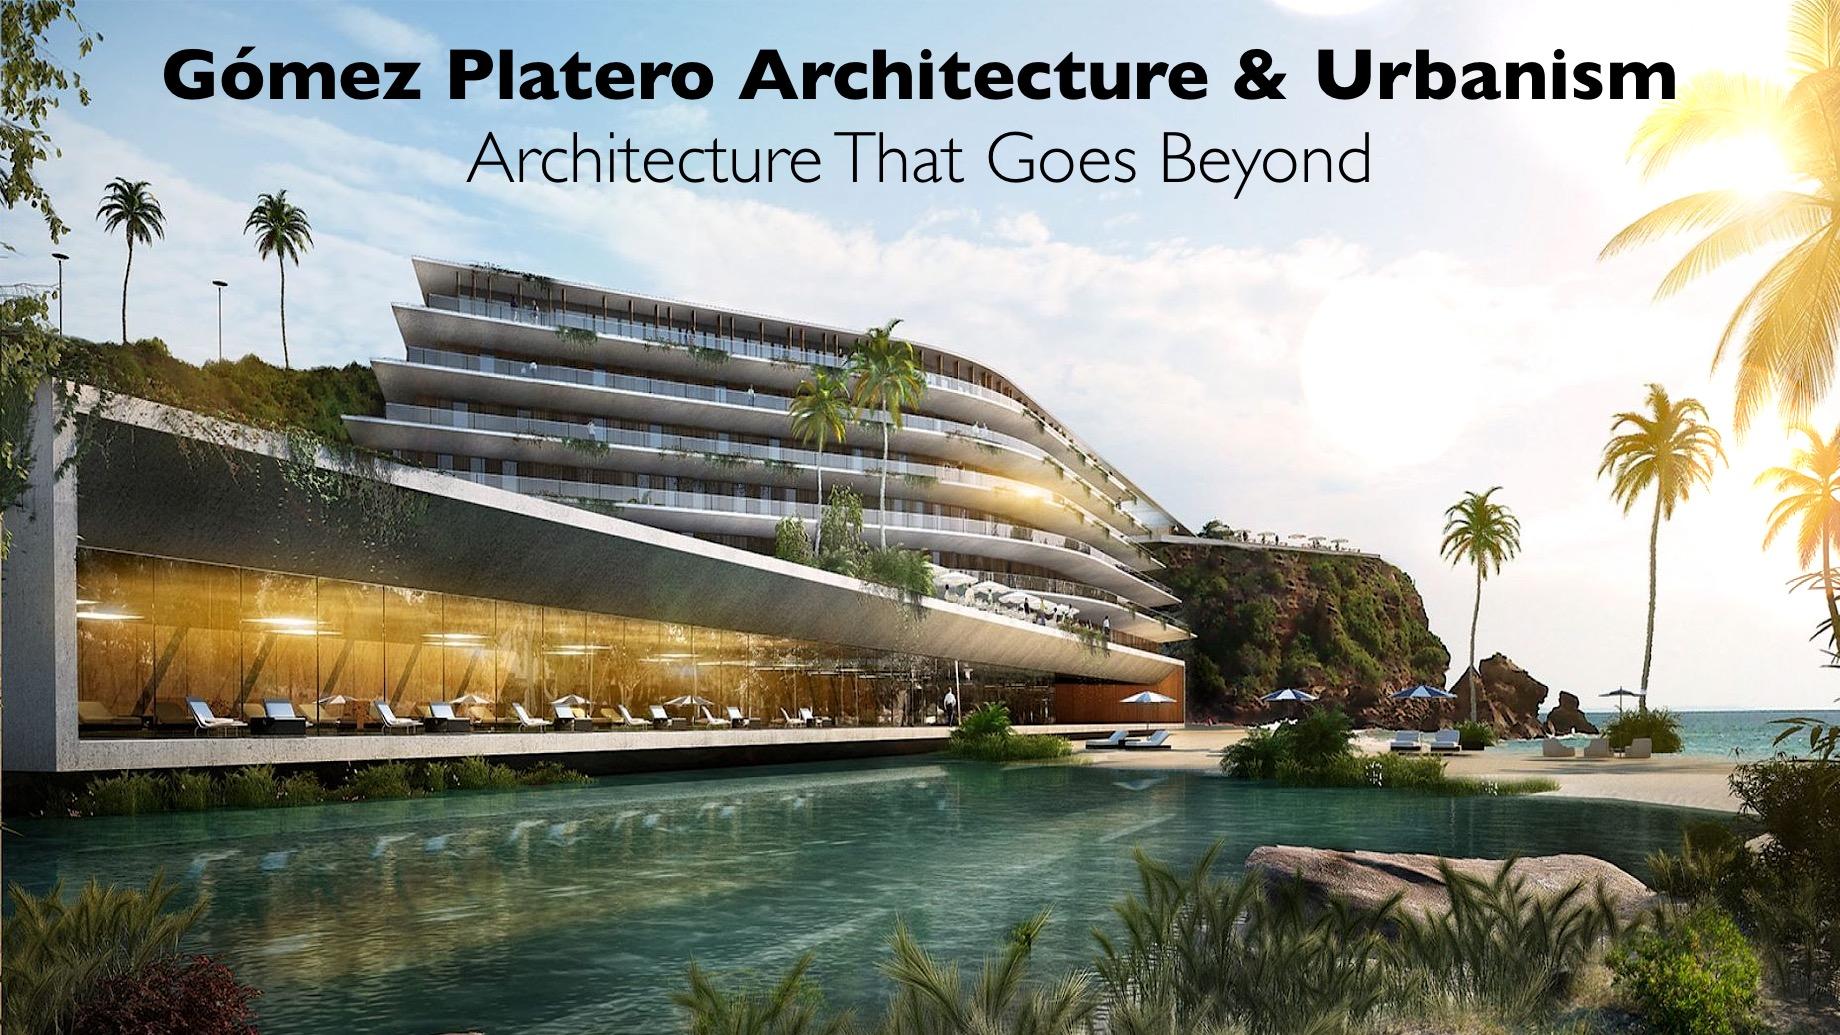 Gómez Platero Architecture & Urbanism - Architecture That Goes Beyond